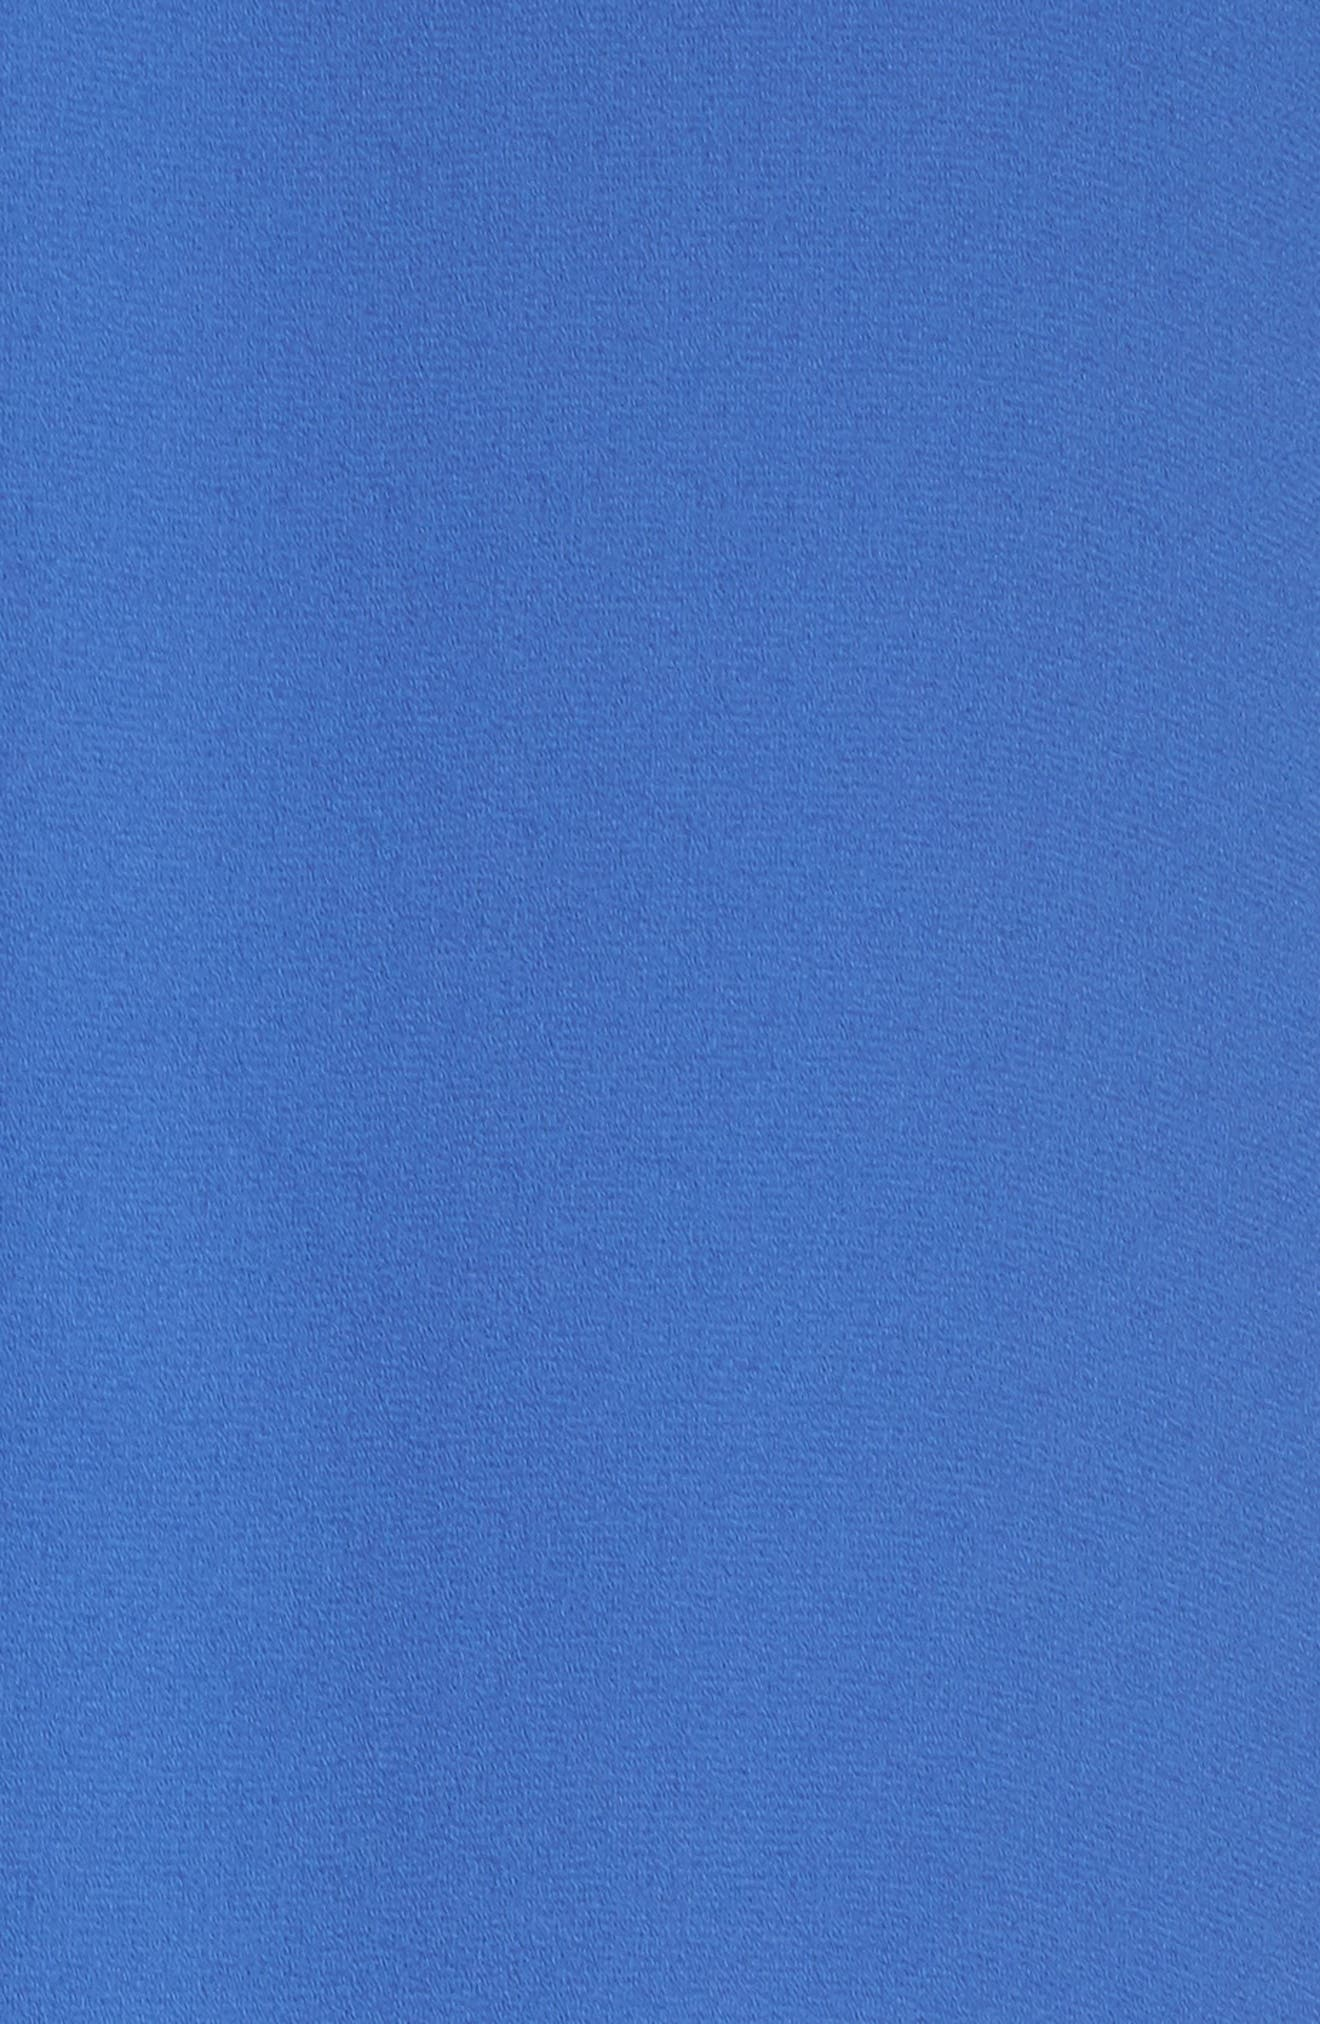 Asymmetric Hem Shift Dress,                             Alternate thumbnail 5, color,                             Denim Blue